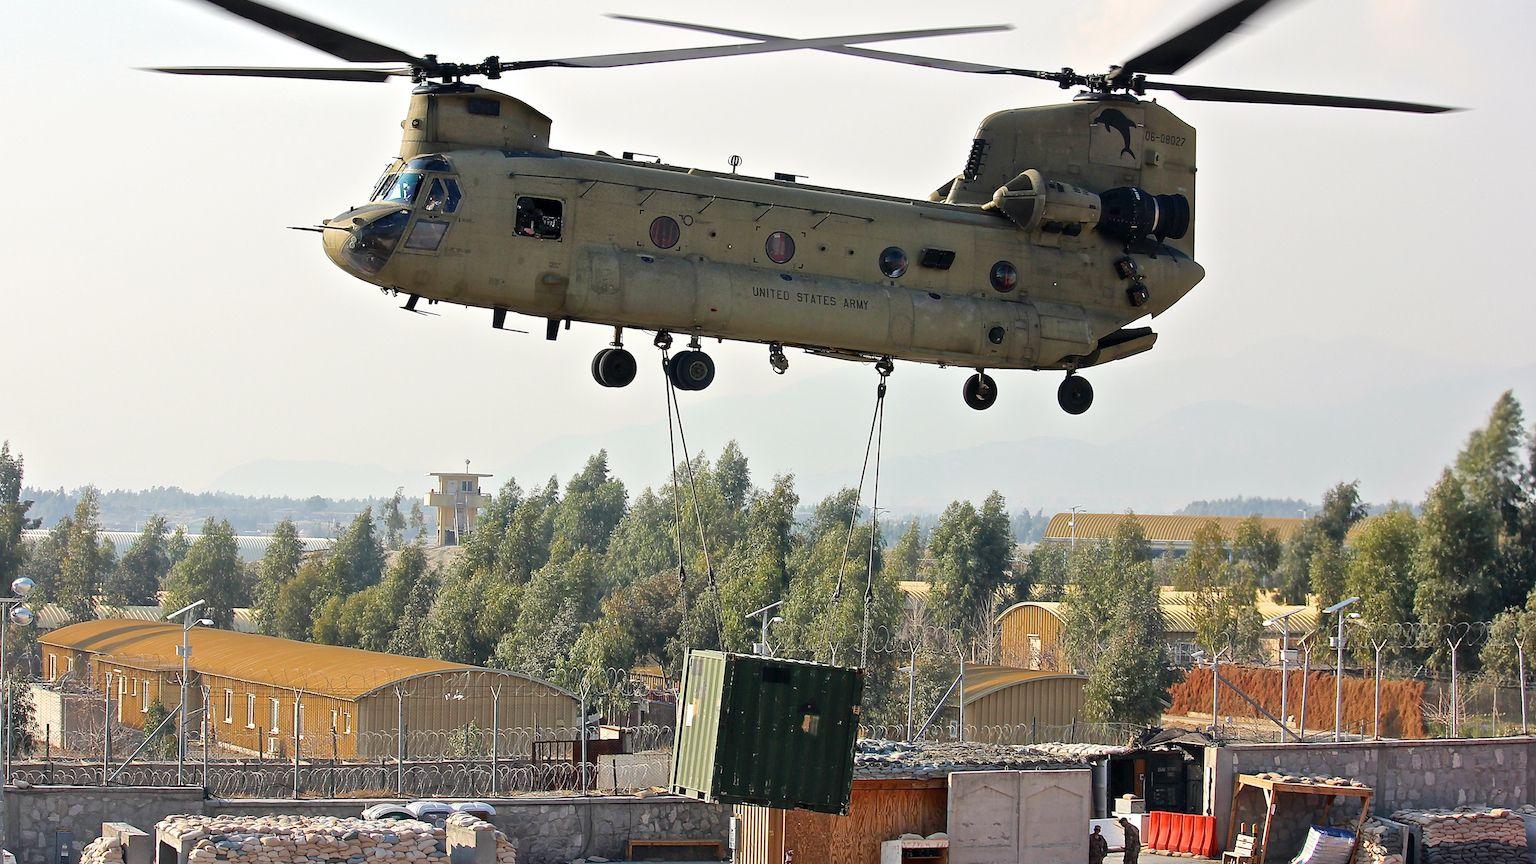 U.S. Commandos Have Their Own Mobile, Modular Workshops